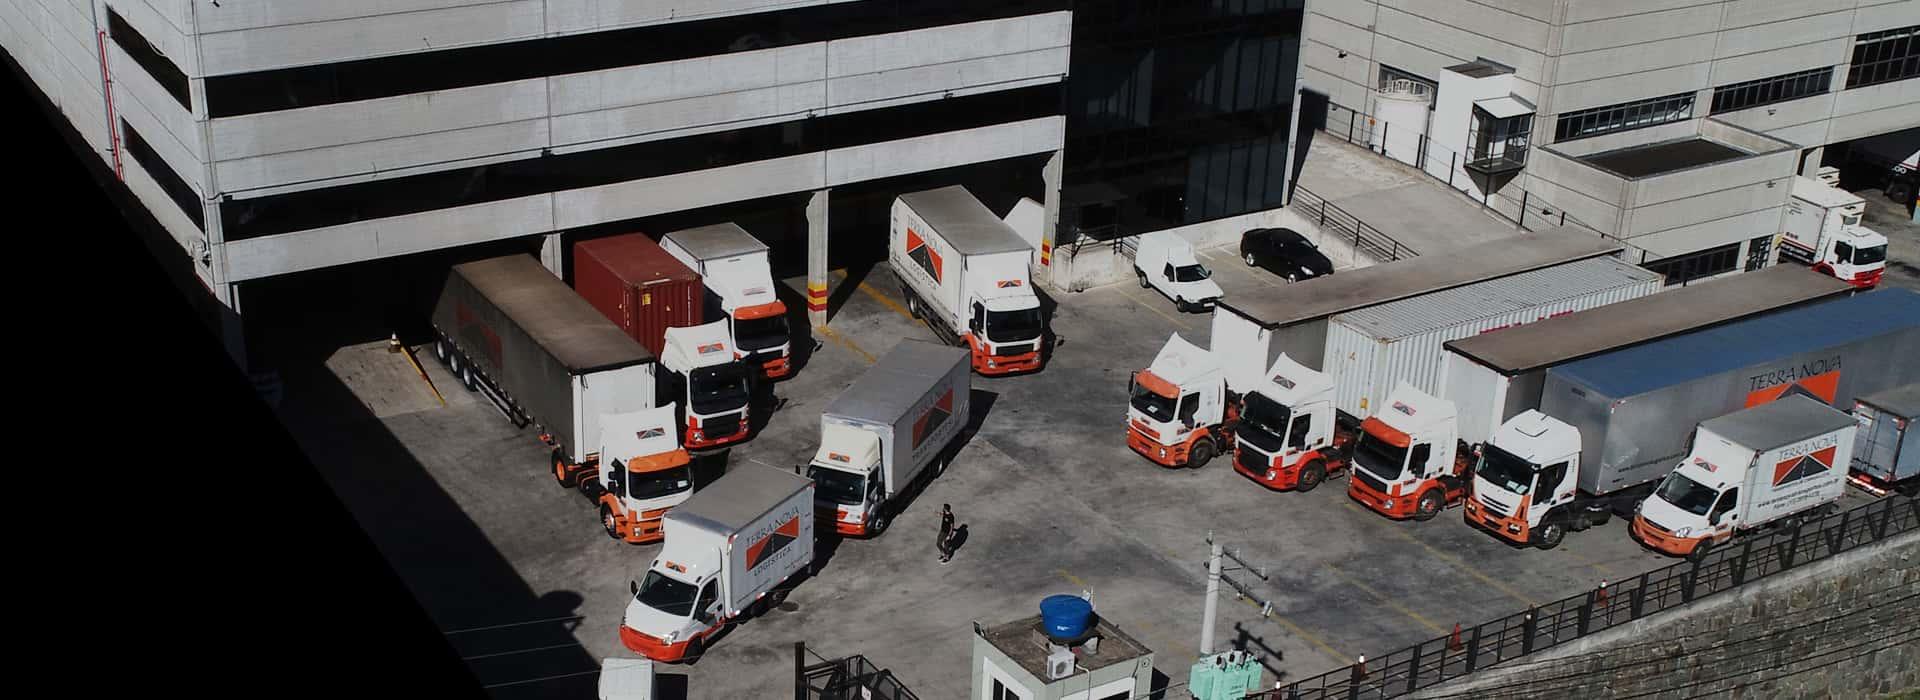 unidades barueri empresa de logistica terra nova logística